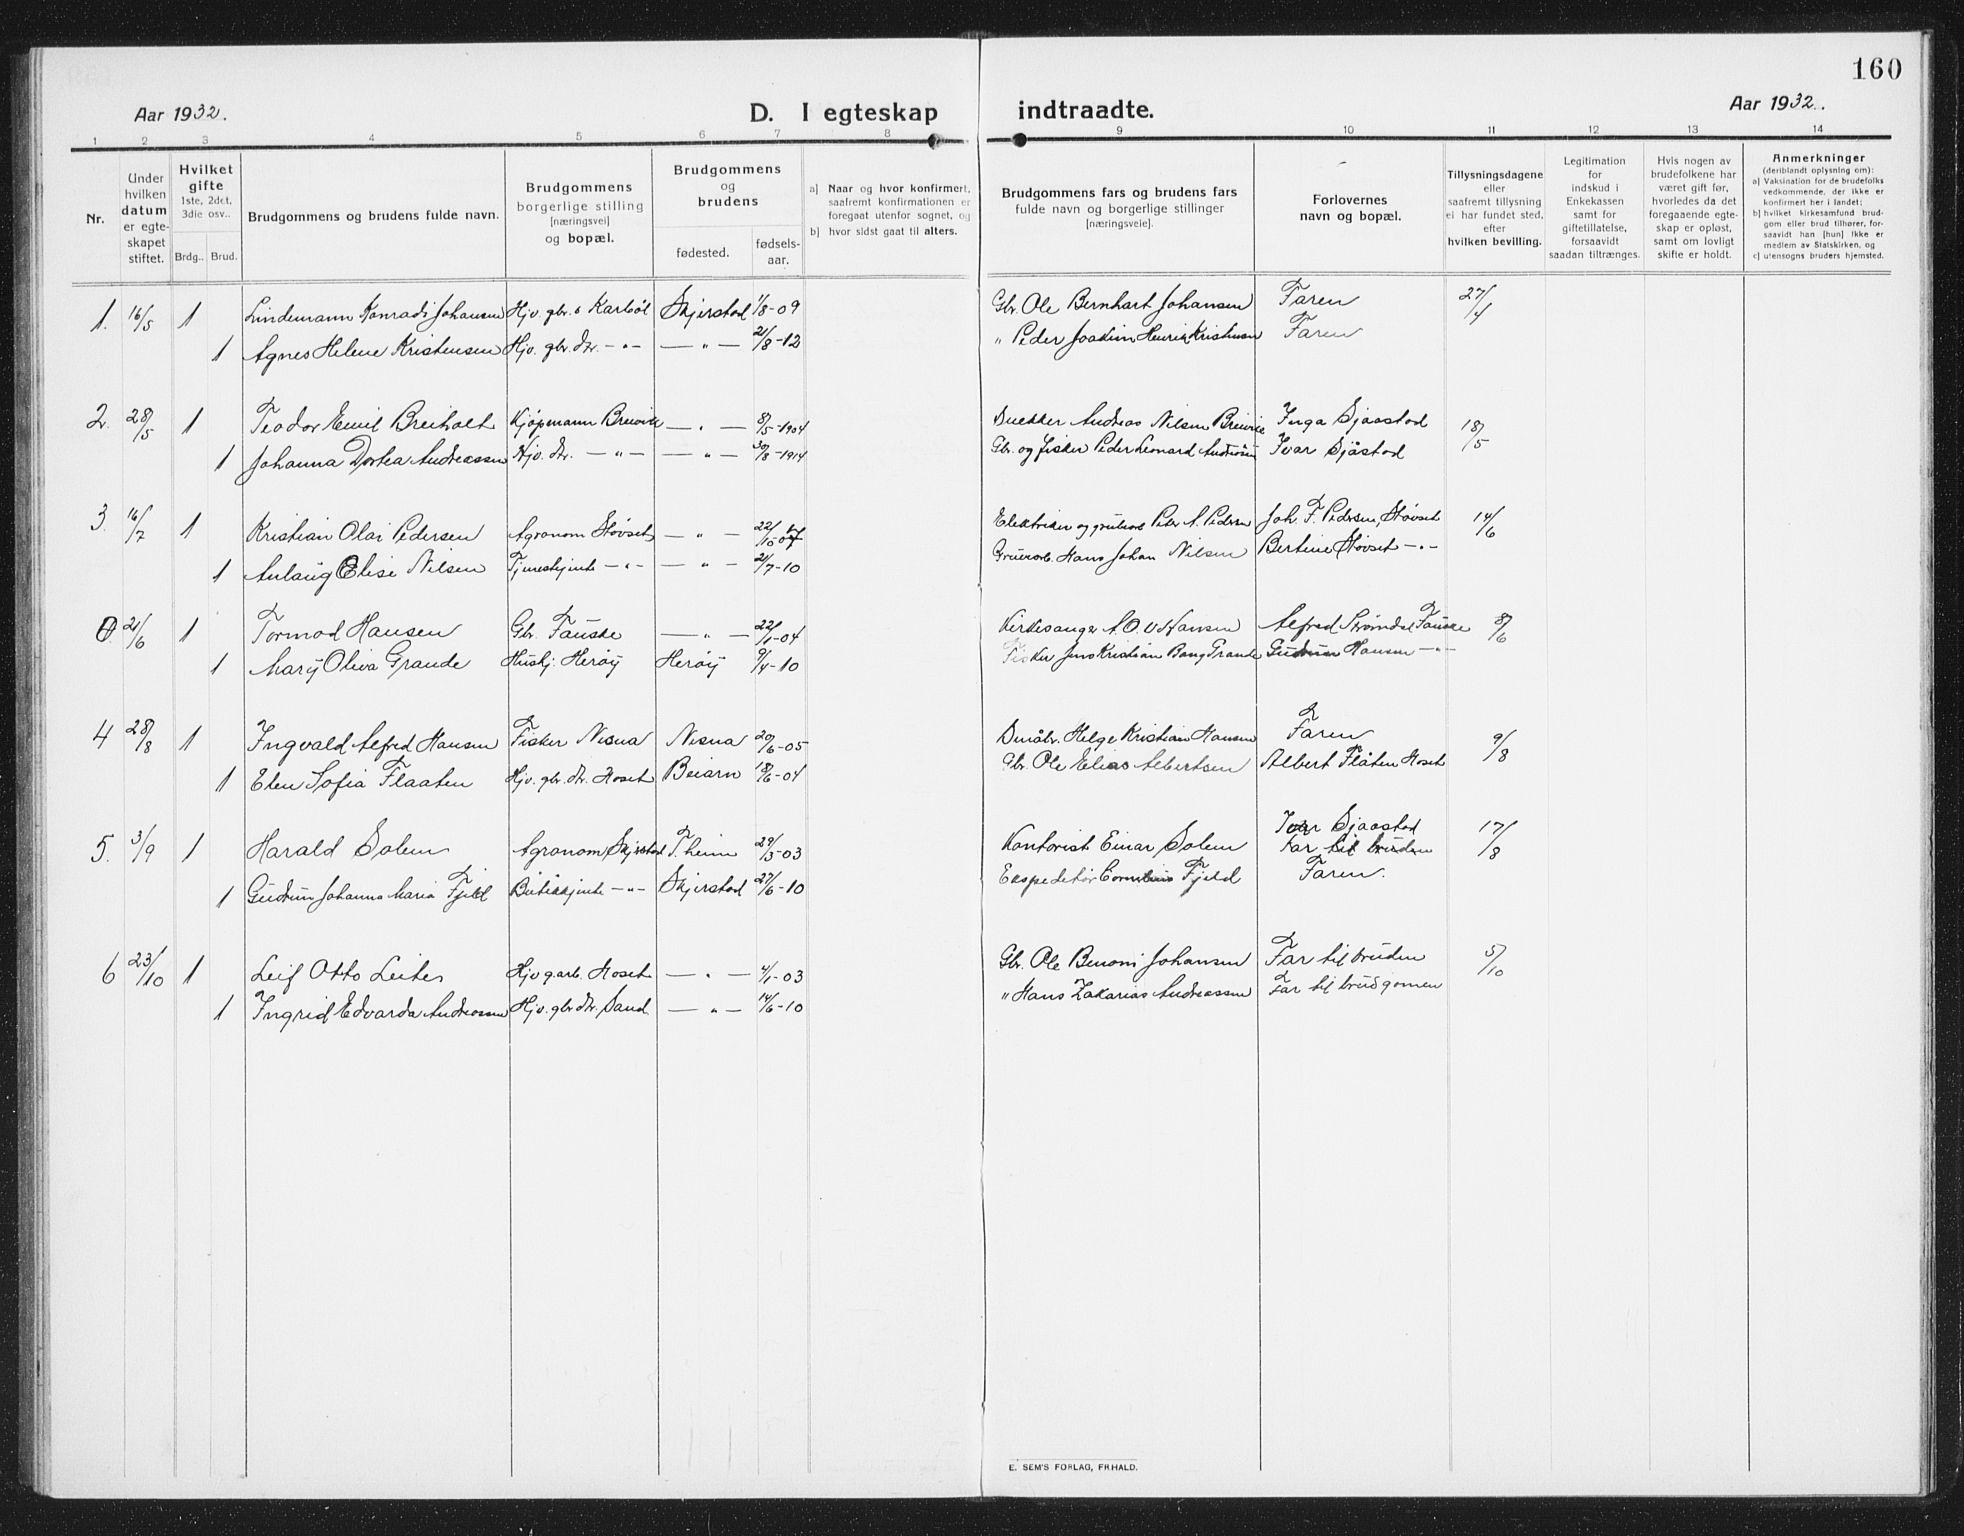 SAT, Ministerialprotokoller, klokkerbøker og fødselsregistre - Nordland, 852/L0757: Klokkerbok nr. 852C08, 1916-1934, s. 160